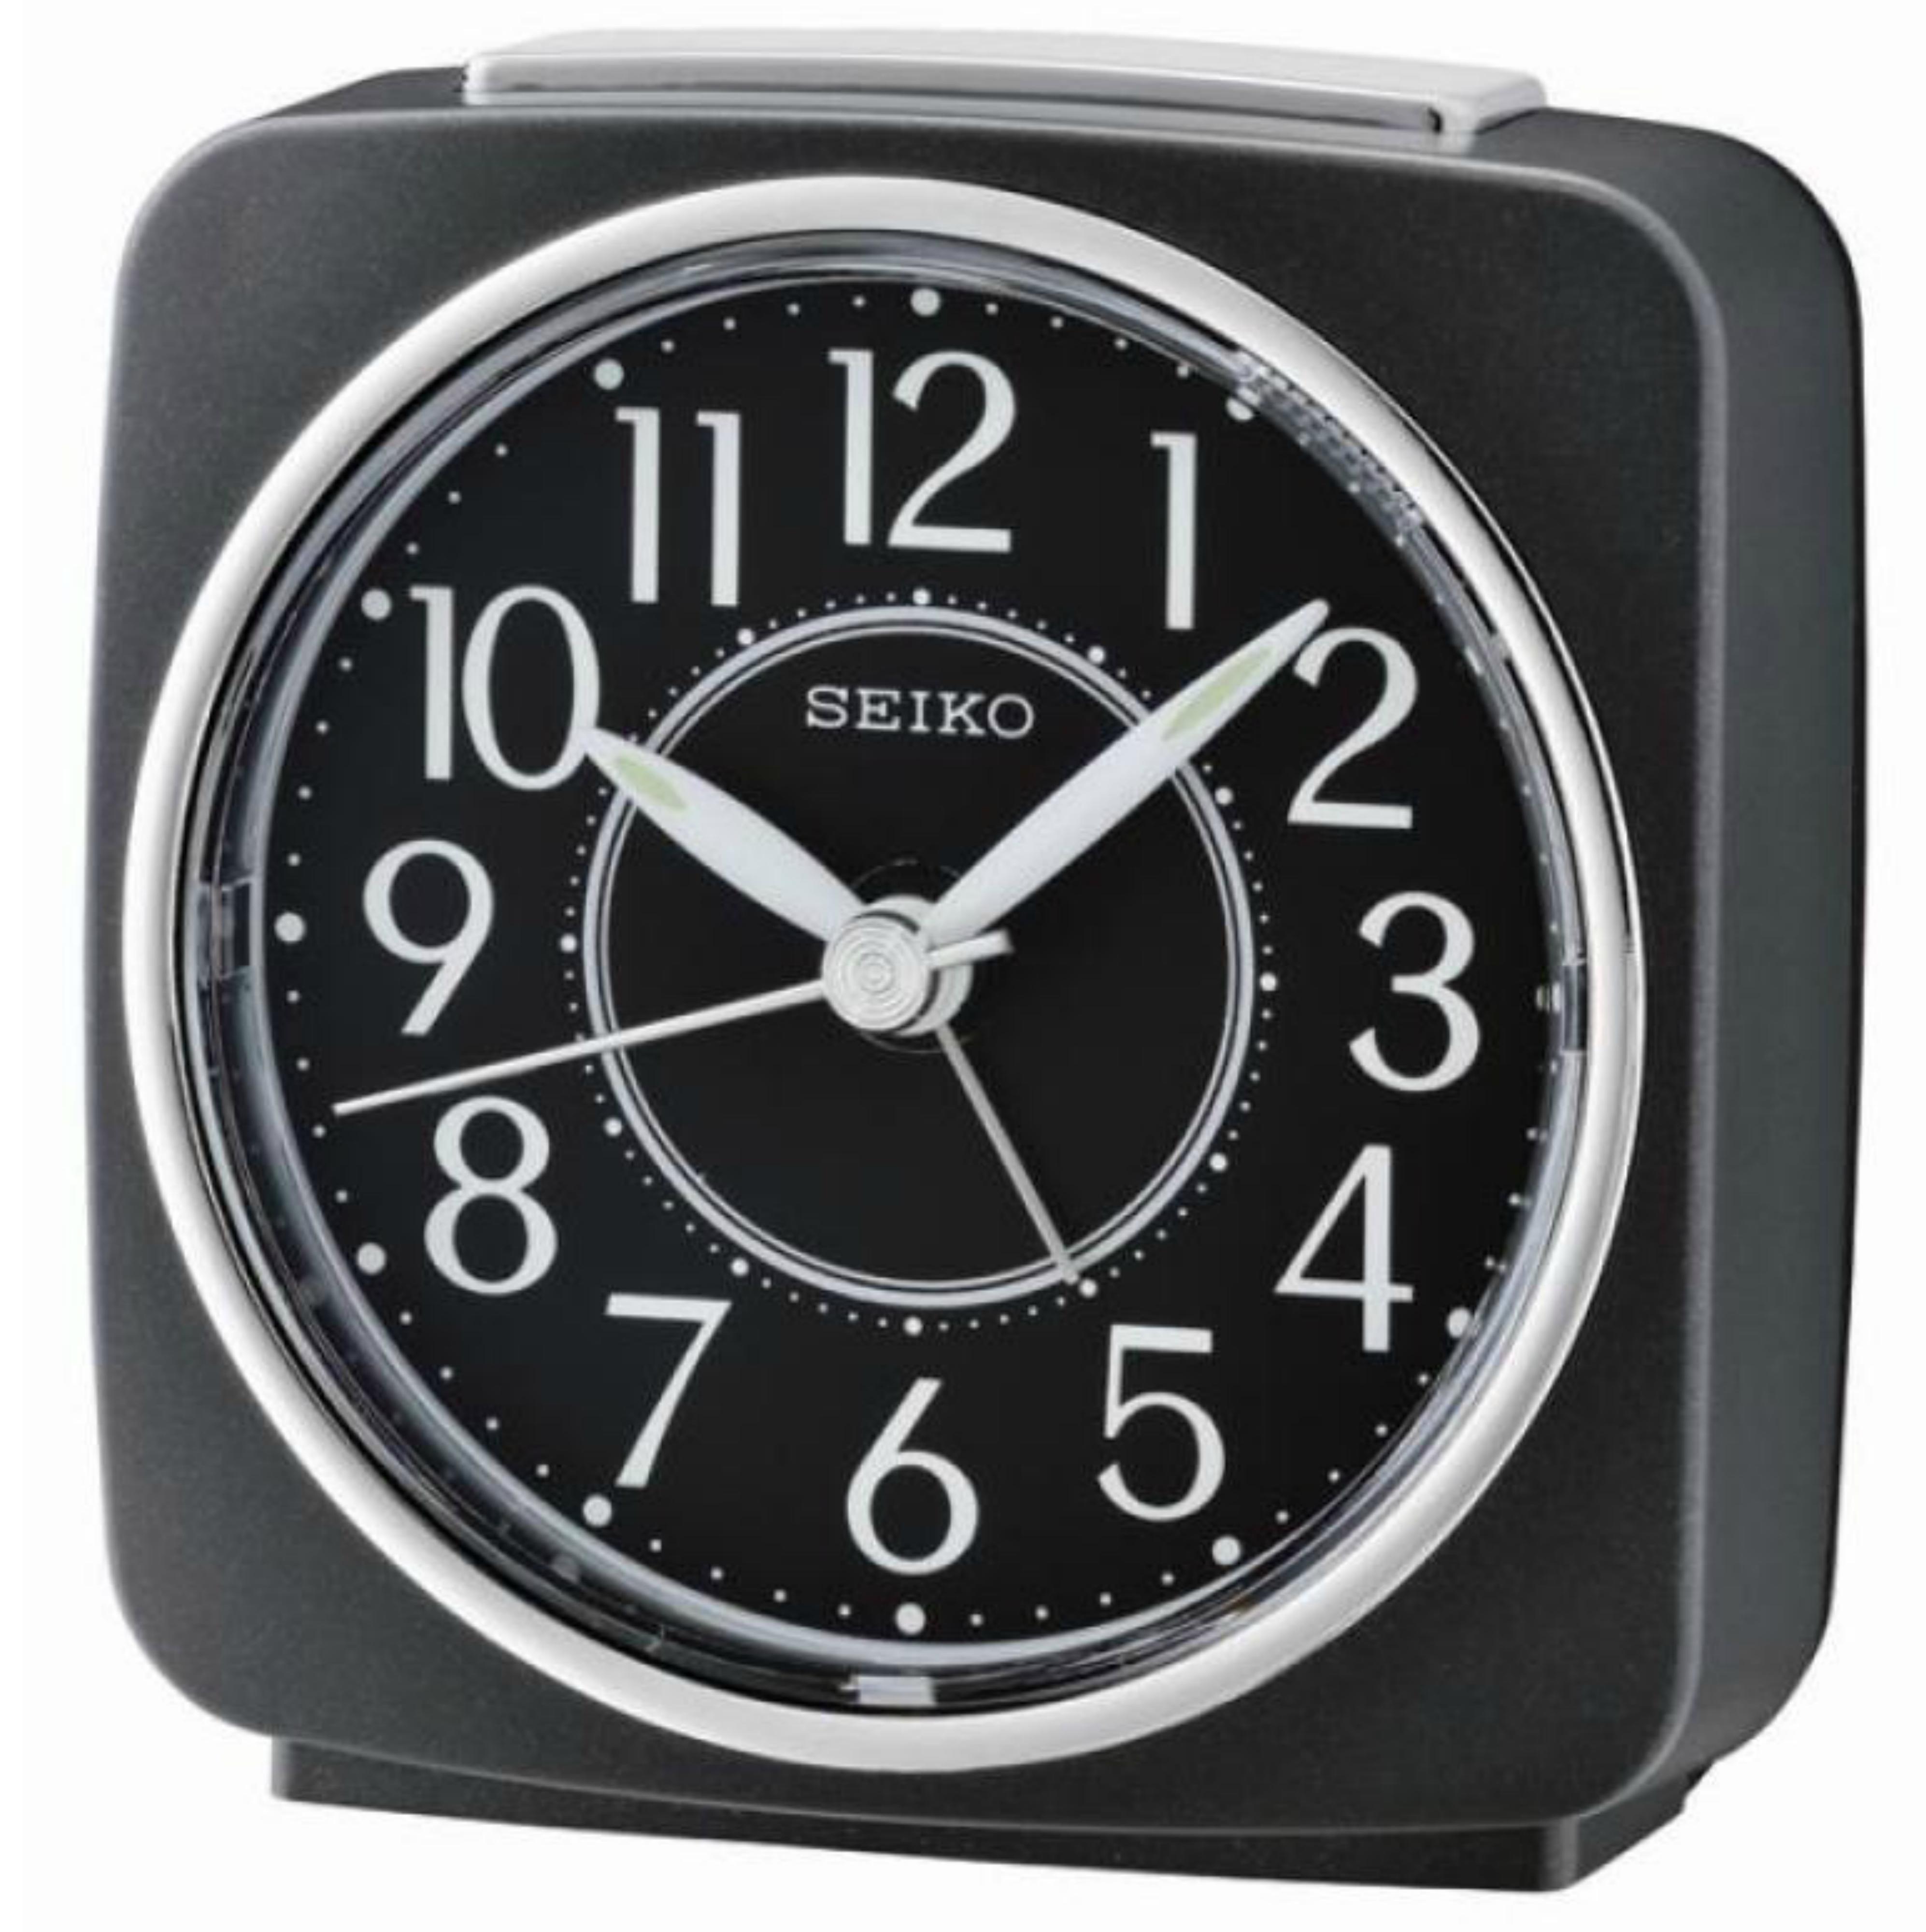 Seiko QHE140K Beep Alarm Clock|Snooze|Analog|Lumibrite|Sweep Second Hand|Black|